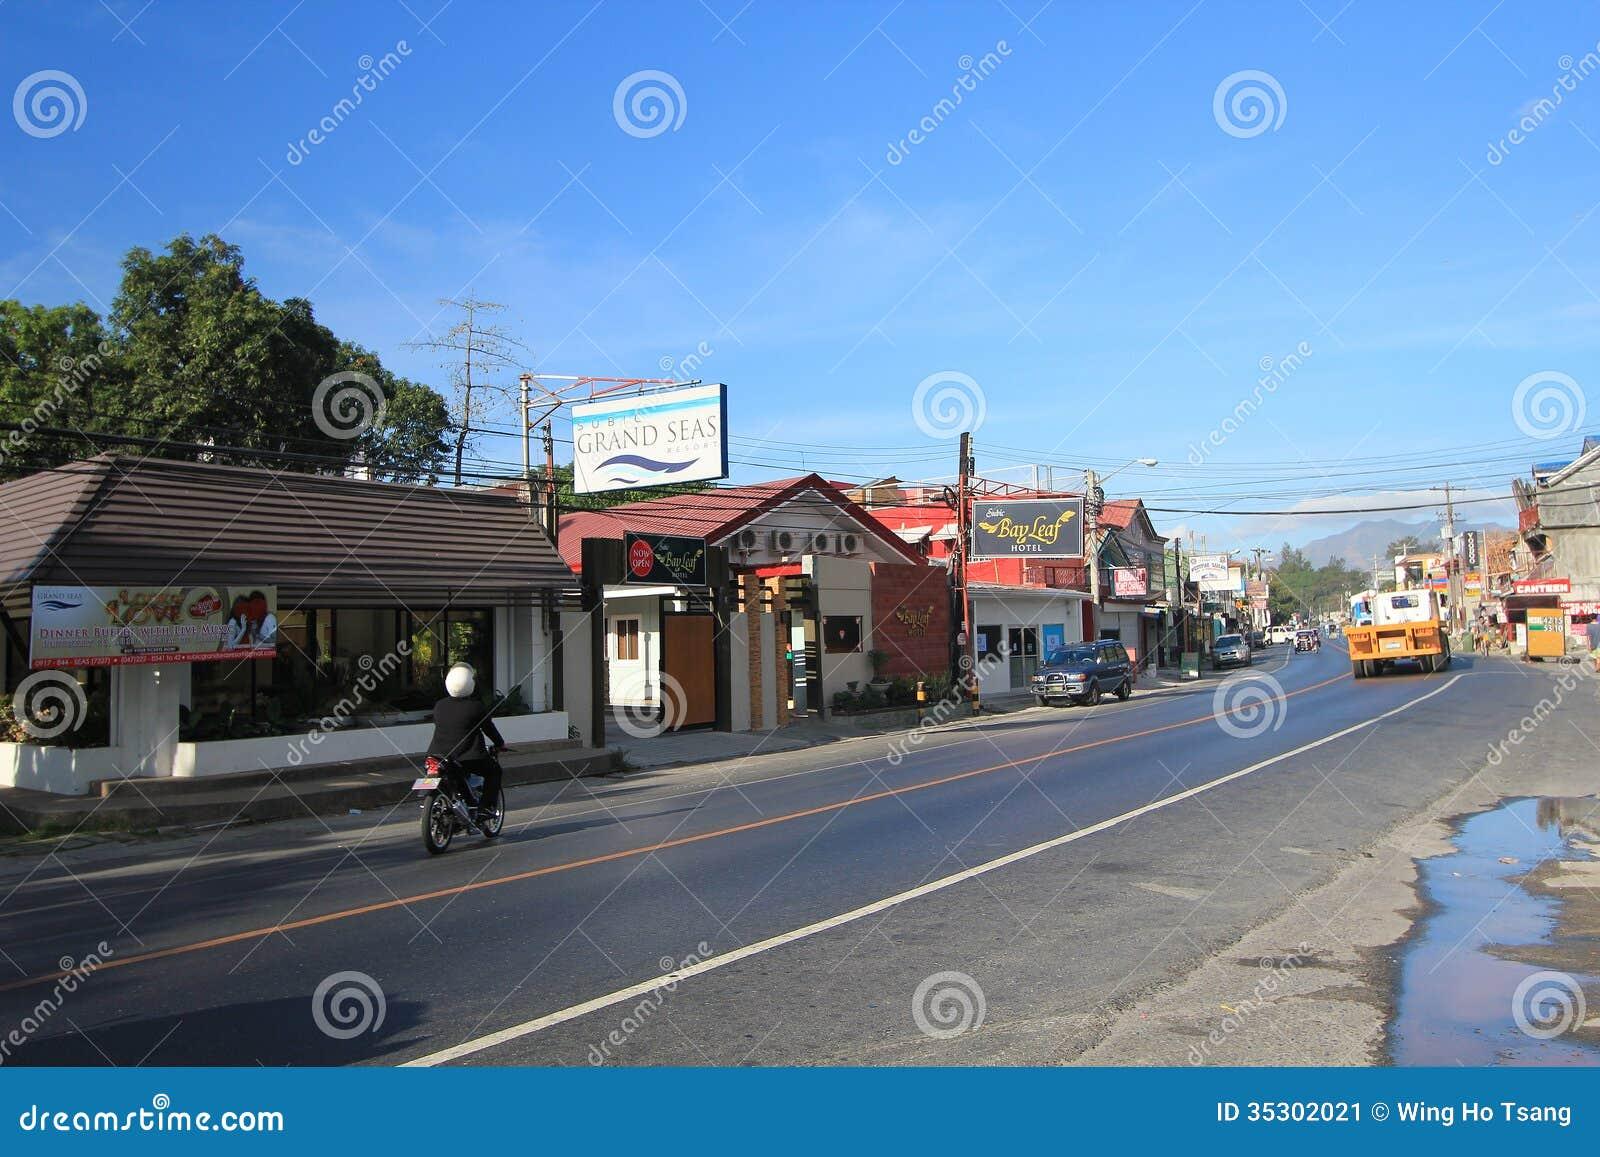 Car, road, town, transport, residential, area, infrastructure, sky, neighbourhood, lane, downtown, city, street, asphalt, suburb,